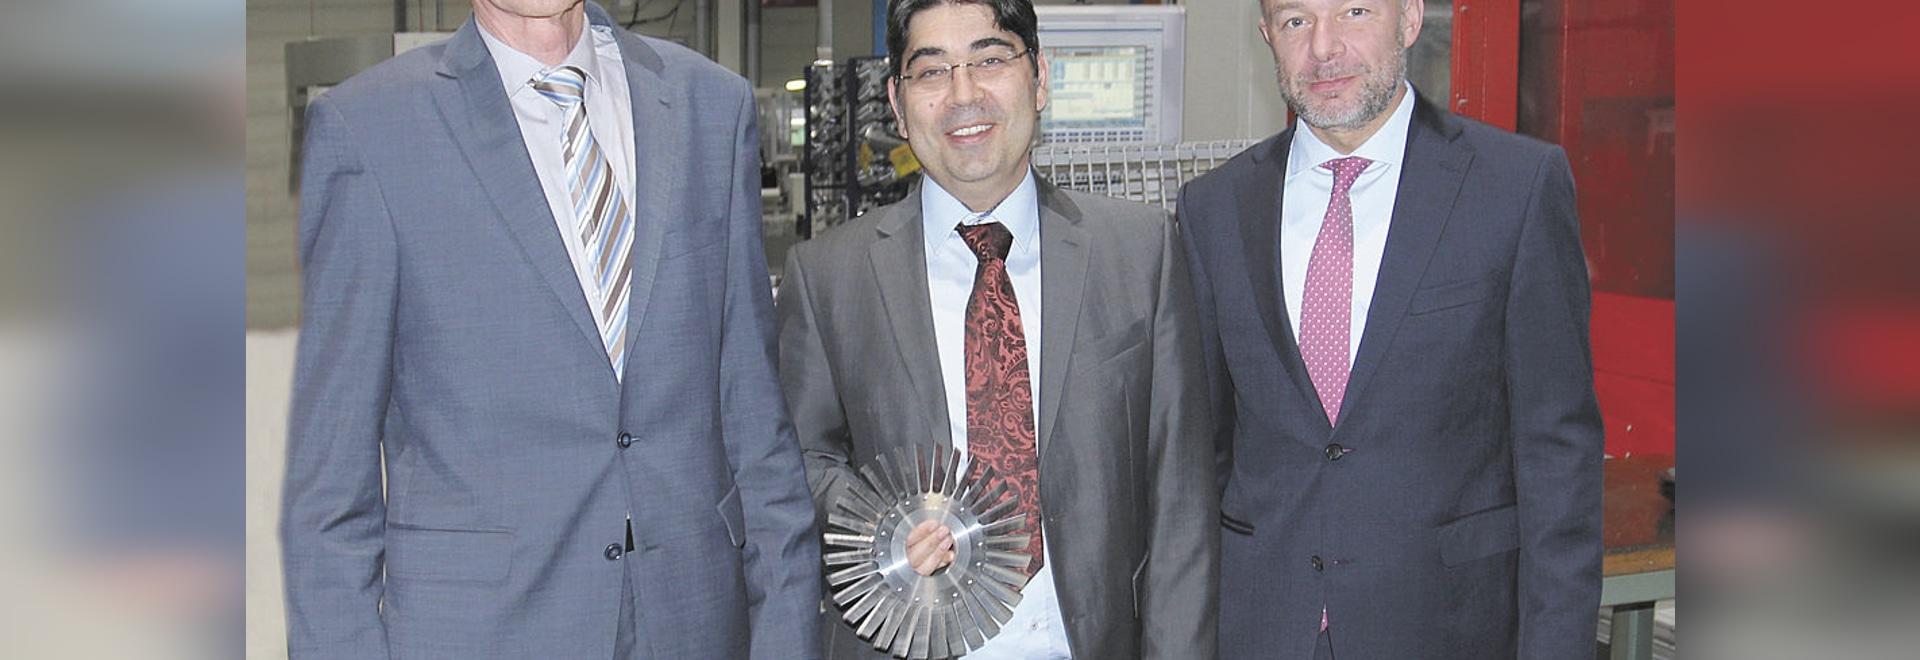 Pfeiffer Vacuum welcomes 2015 Röntgen Prize Winner